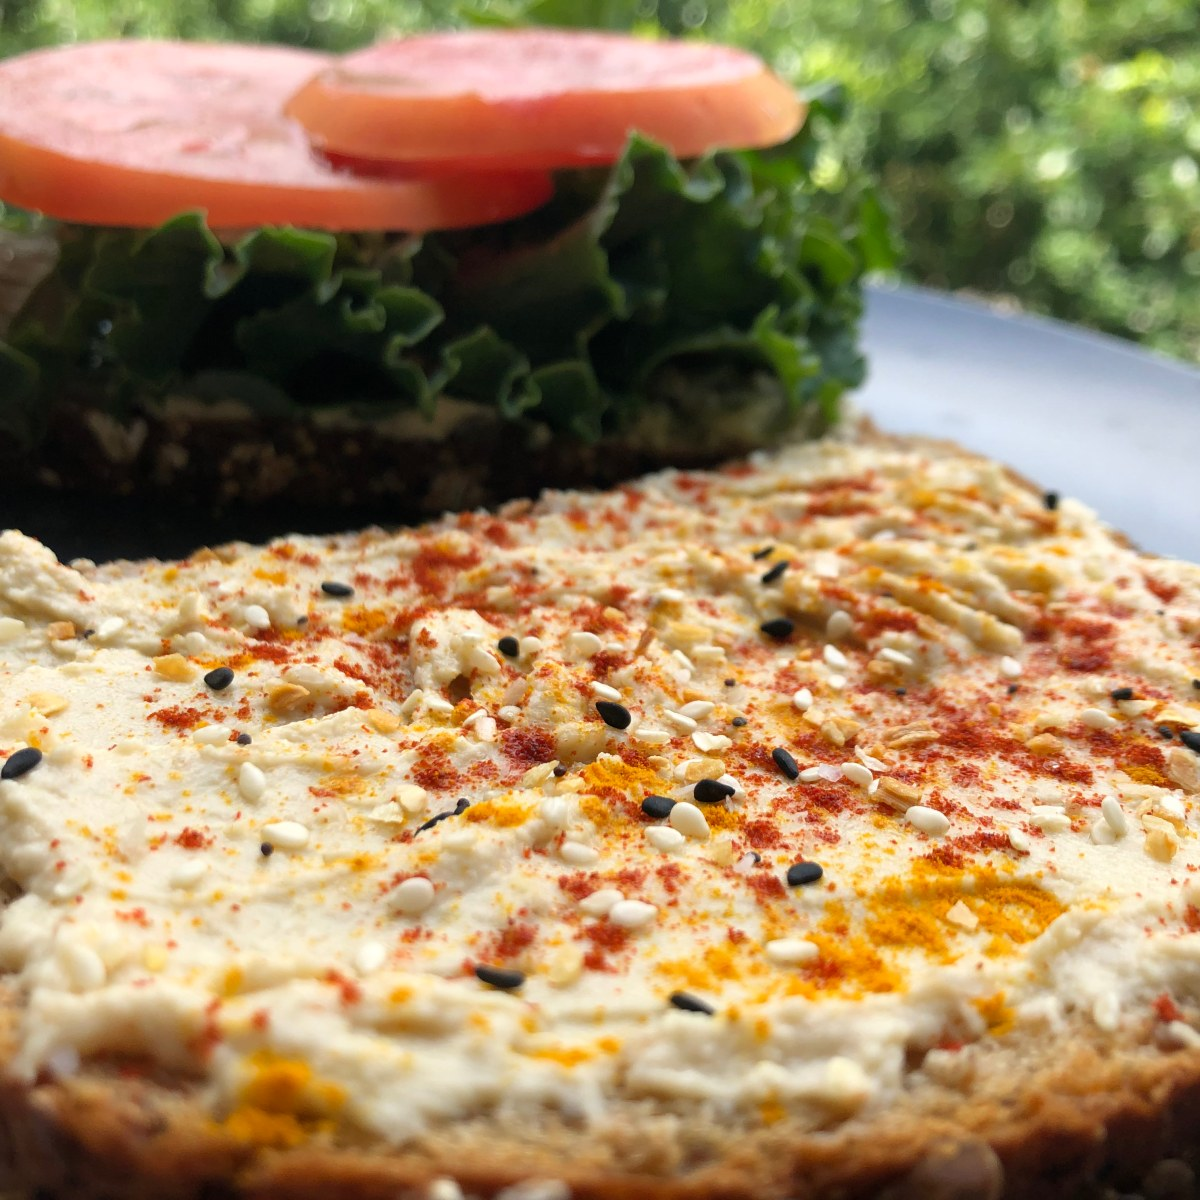 Hummus and Kale Sandwich